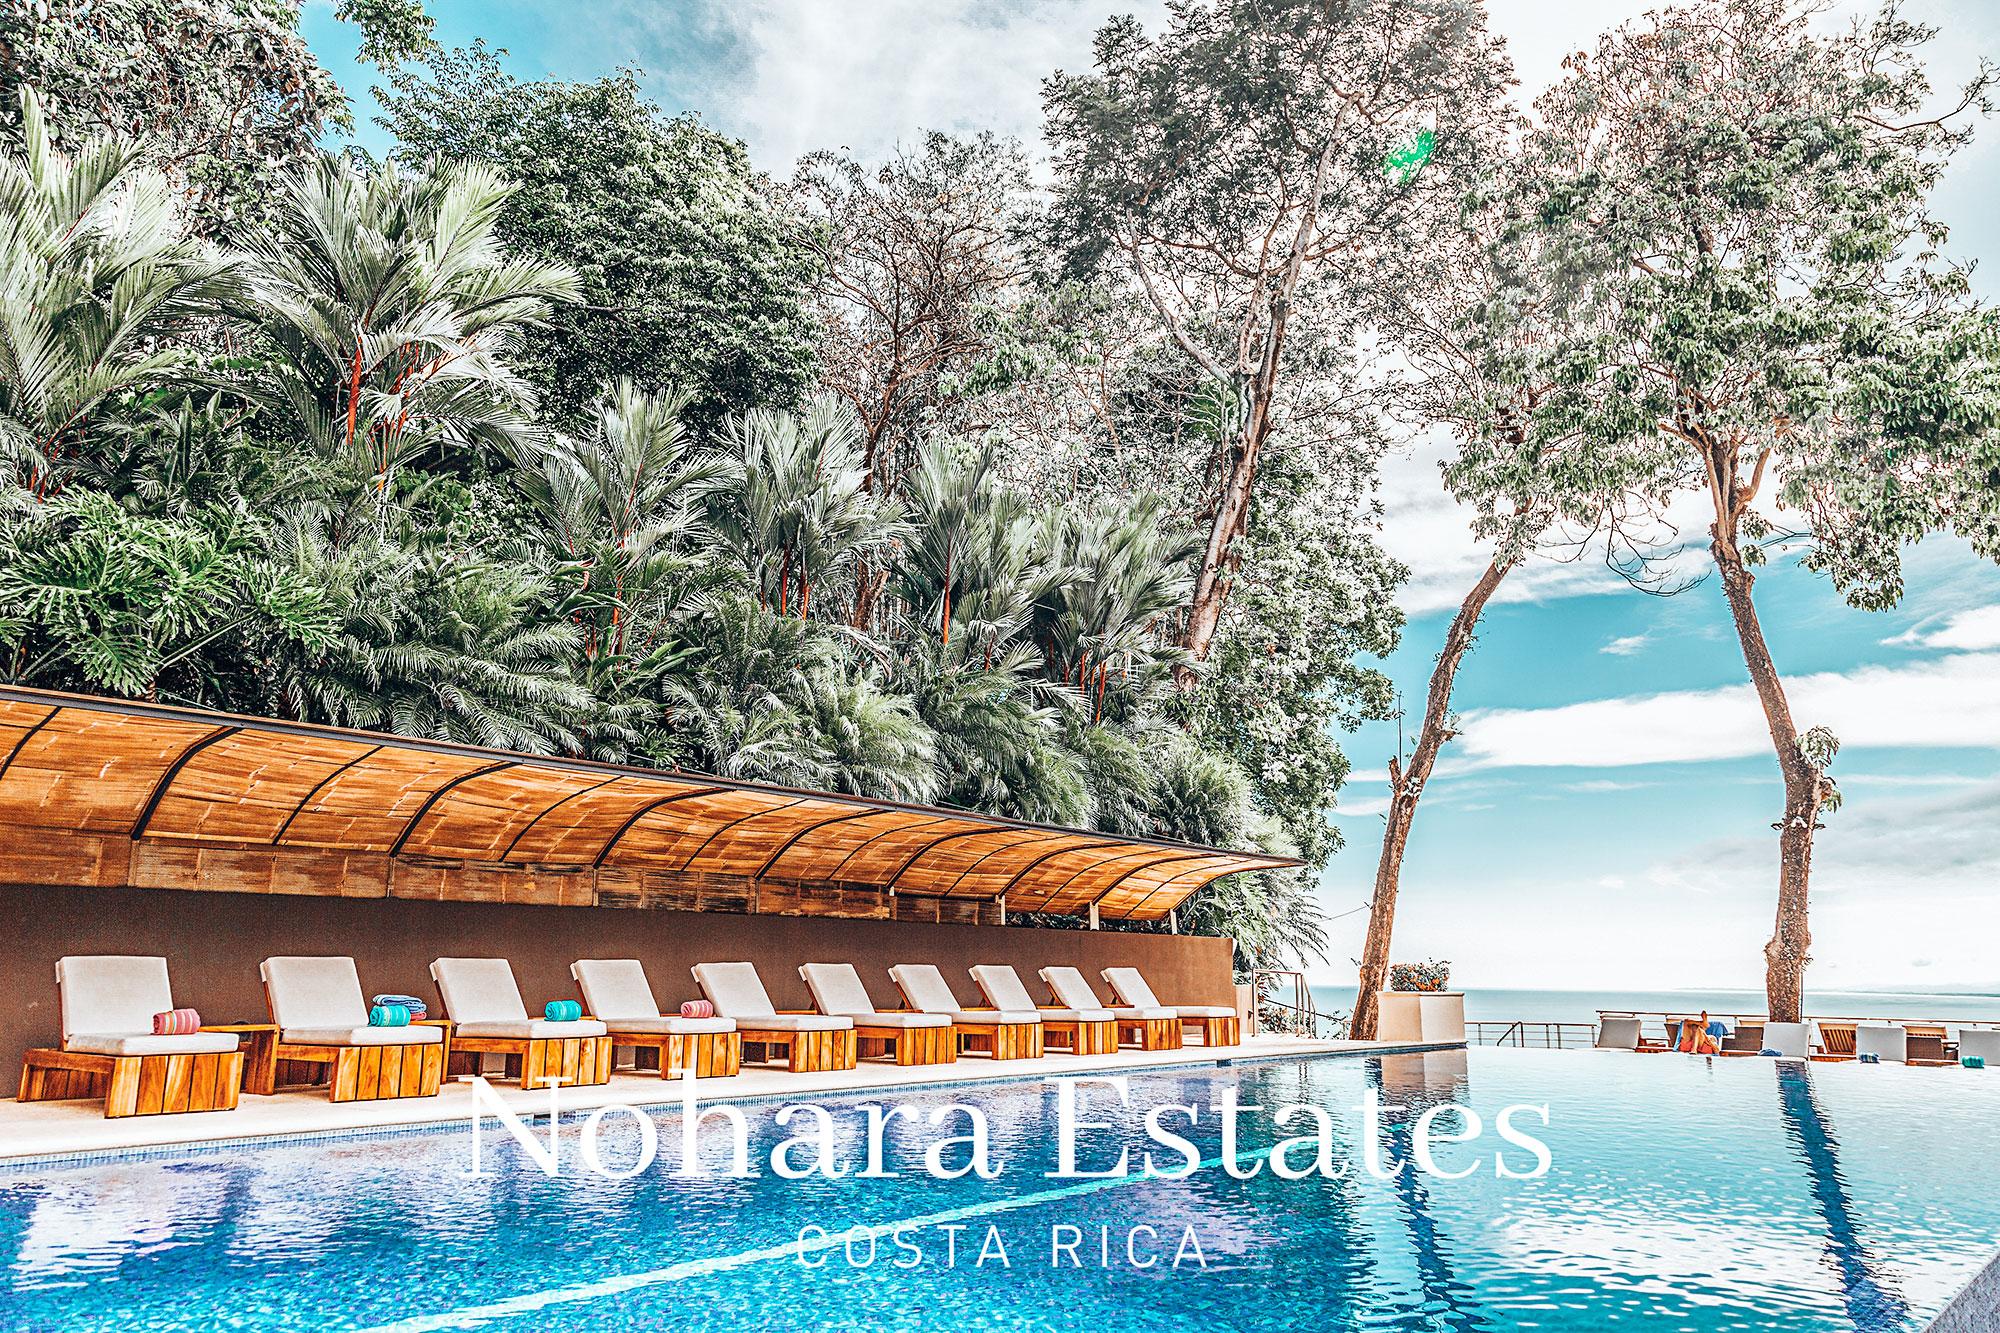 Nohara Estates Costa Rica 125 Apartment Quepos Los Altos 69